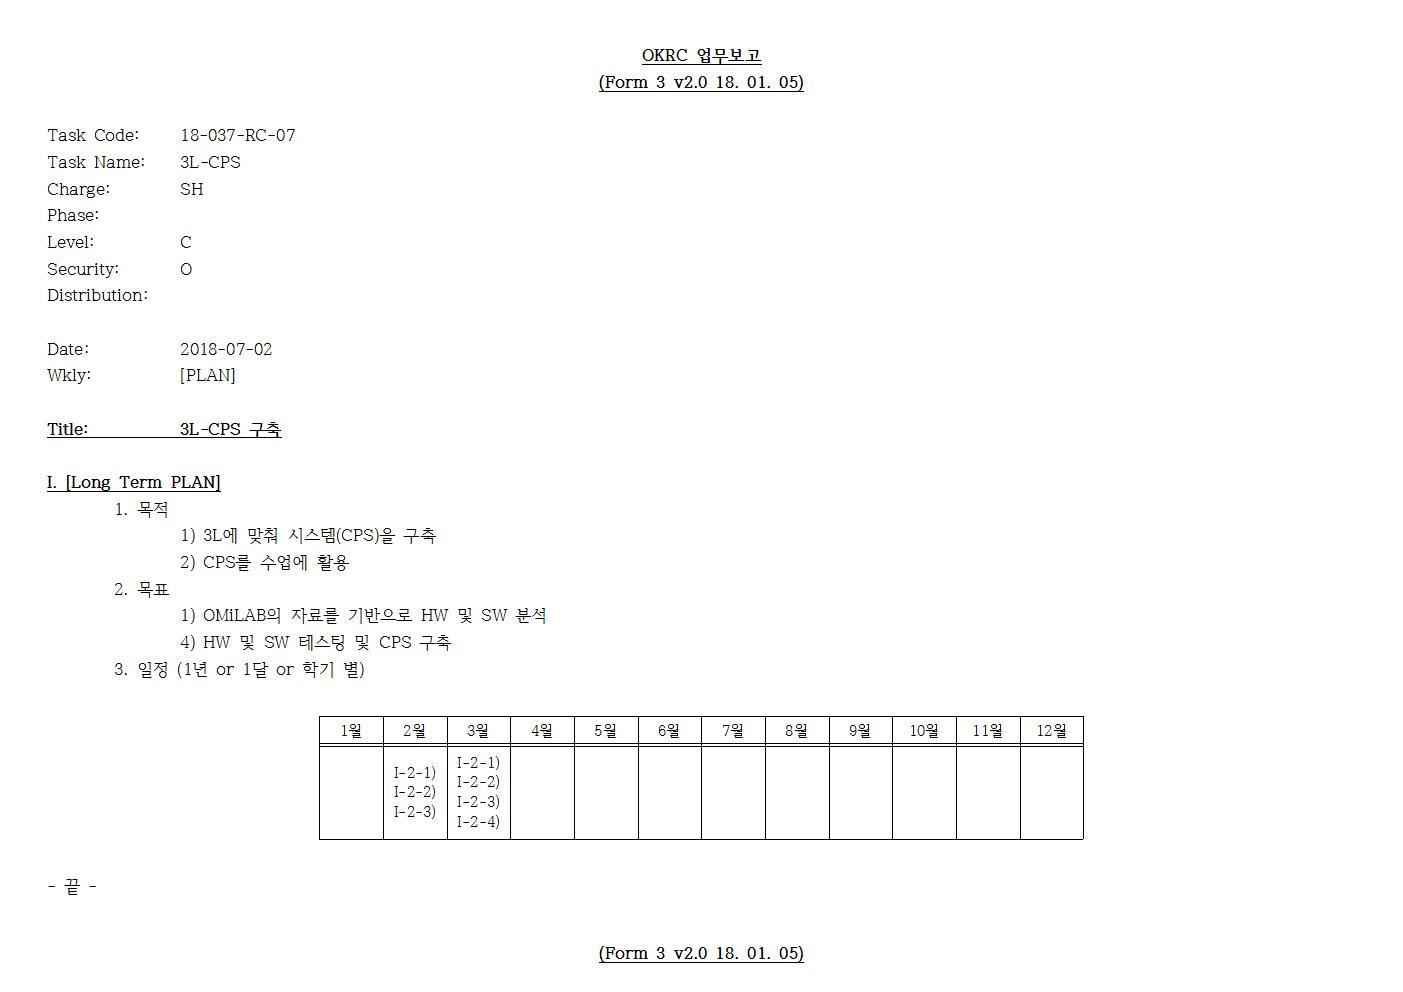 D-[18-037-RC-07]-[3L-CPS]-[2018-07-02][SH]001.jpg